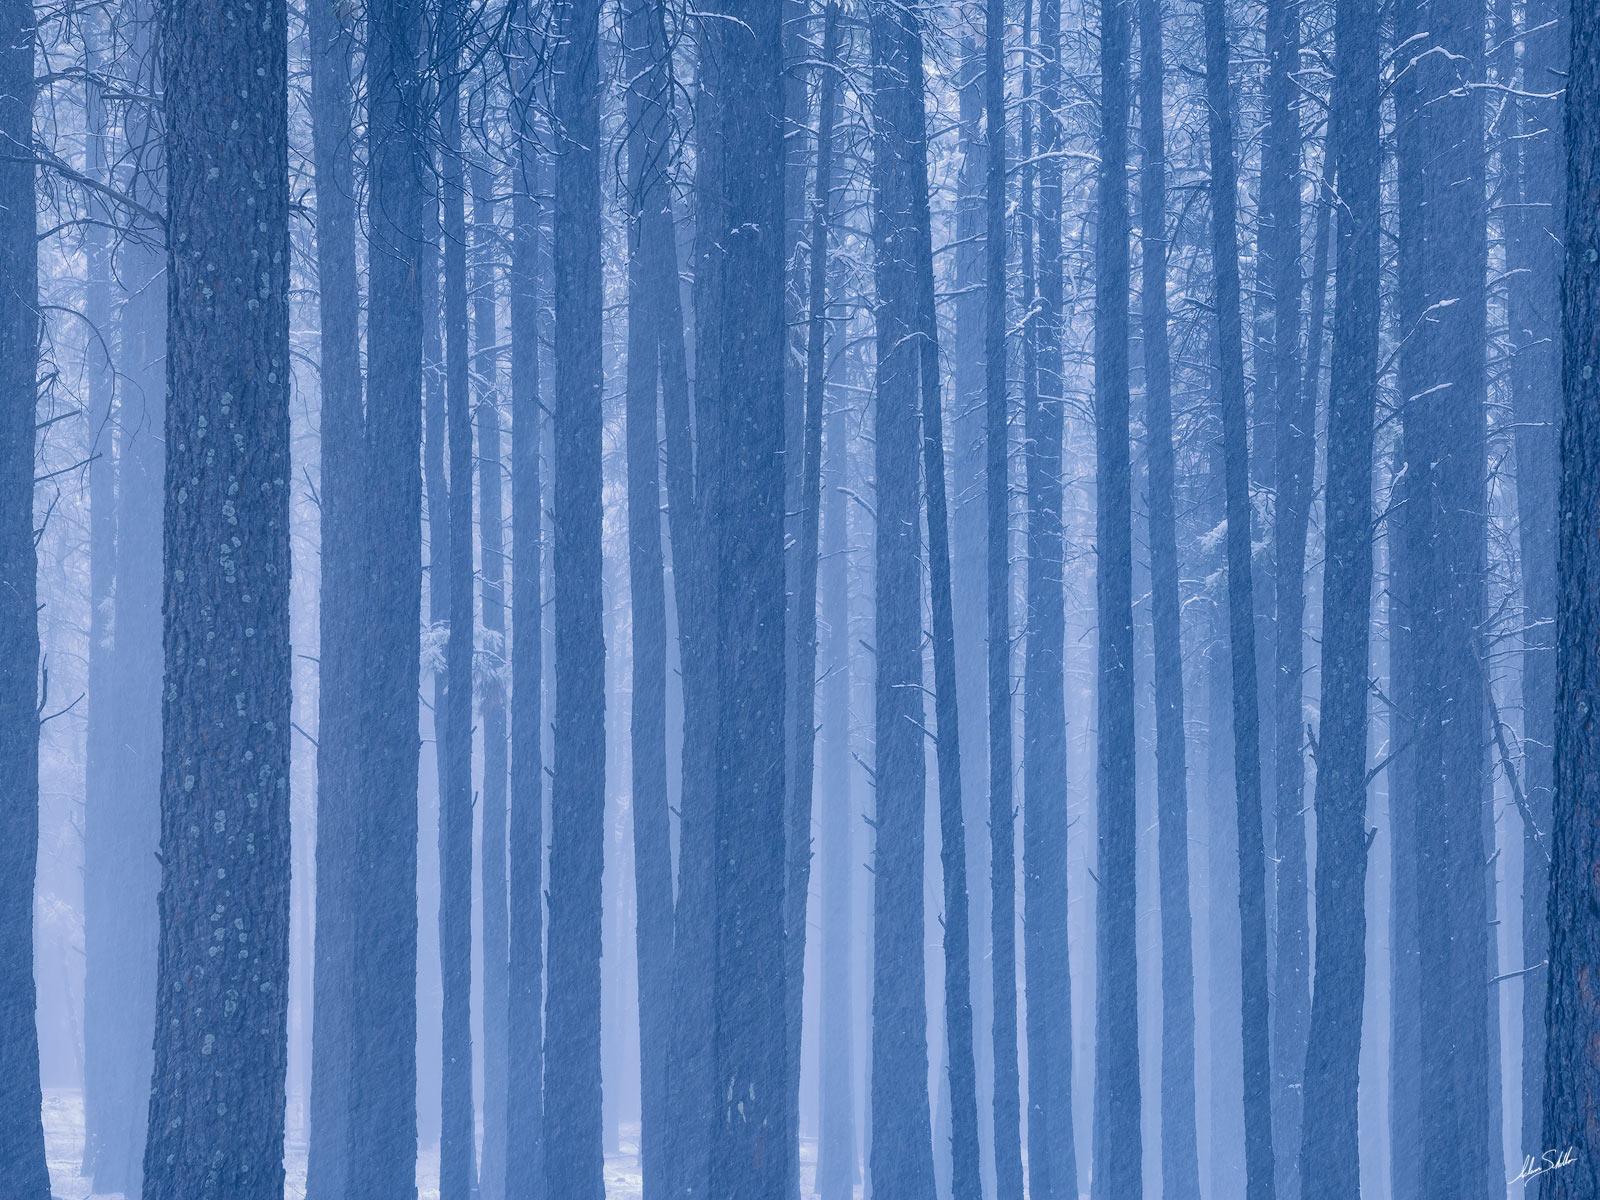 AZ, Arizona, Autumn, Flagstaff, Ponderosa Pine, Snow, Trees, Winter, photo